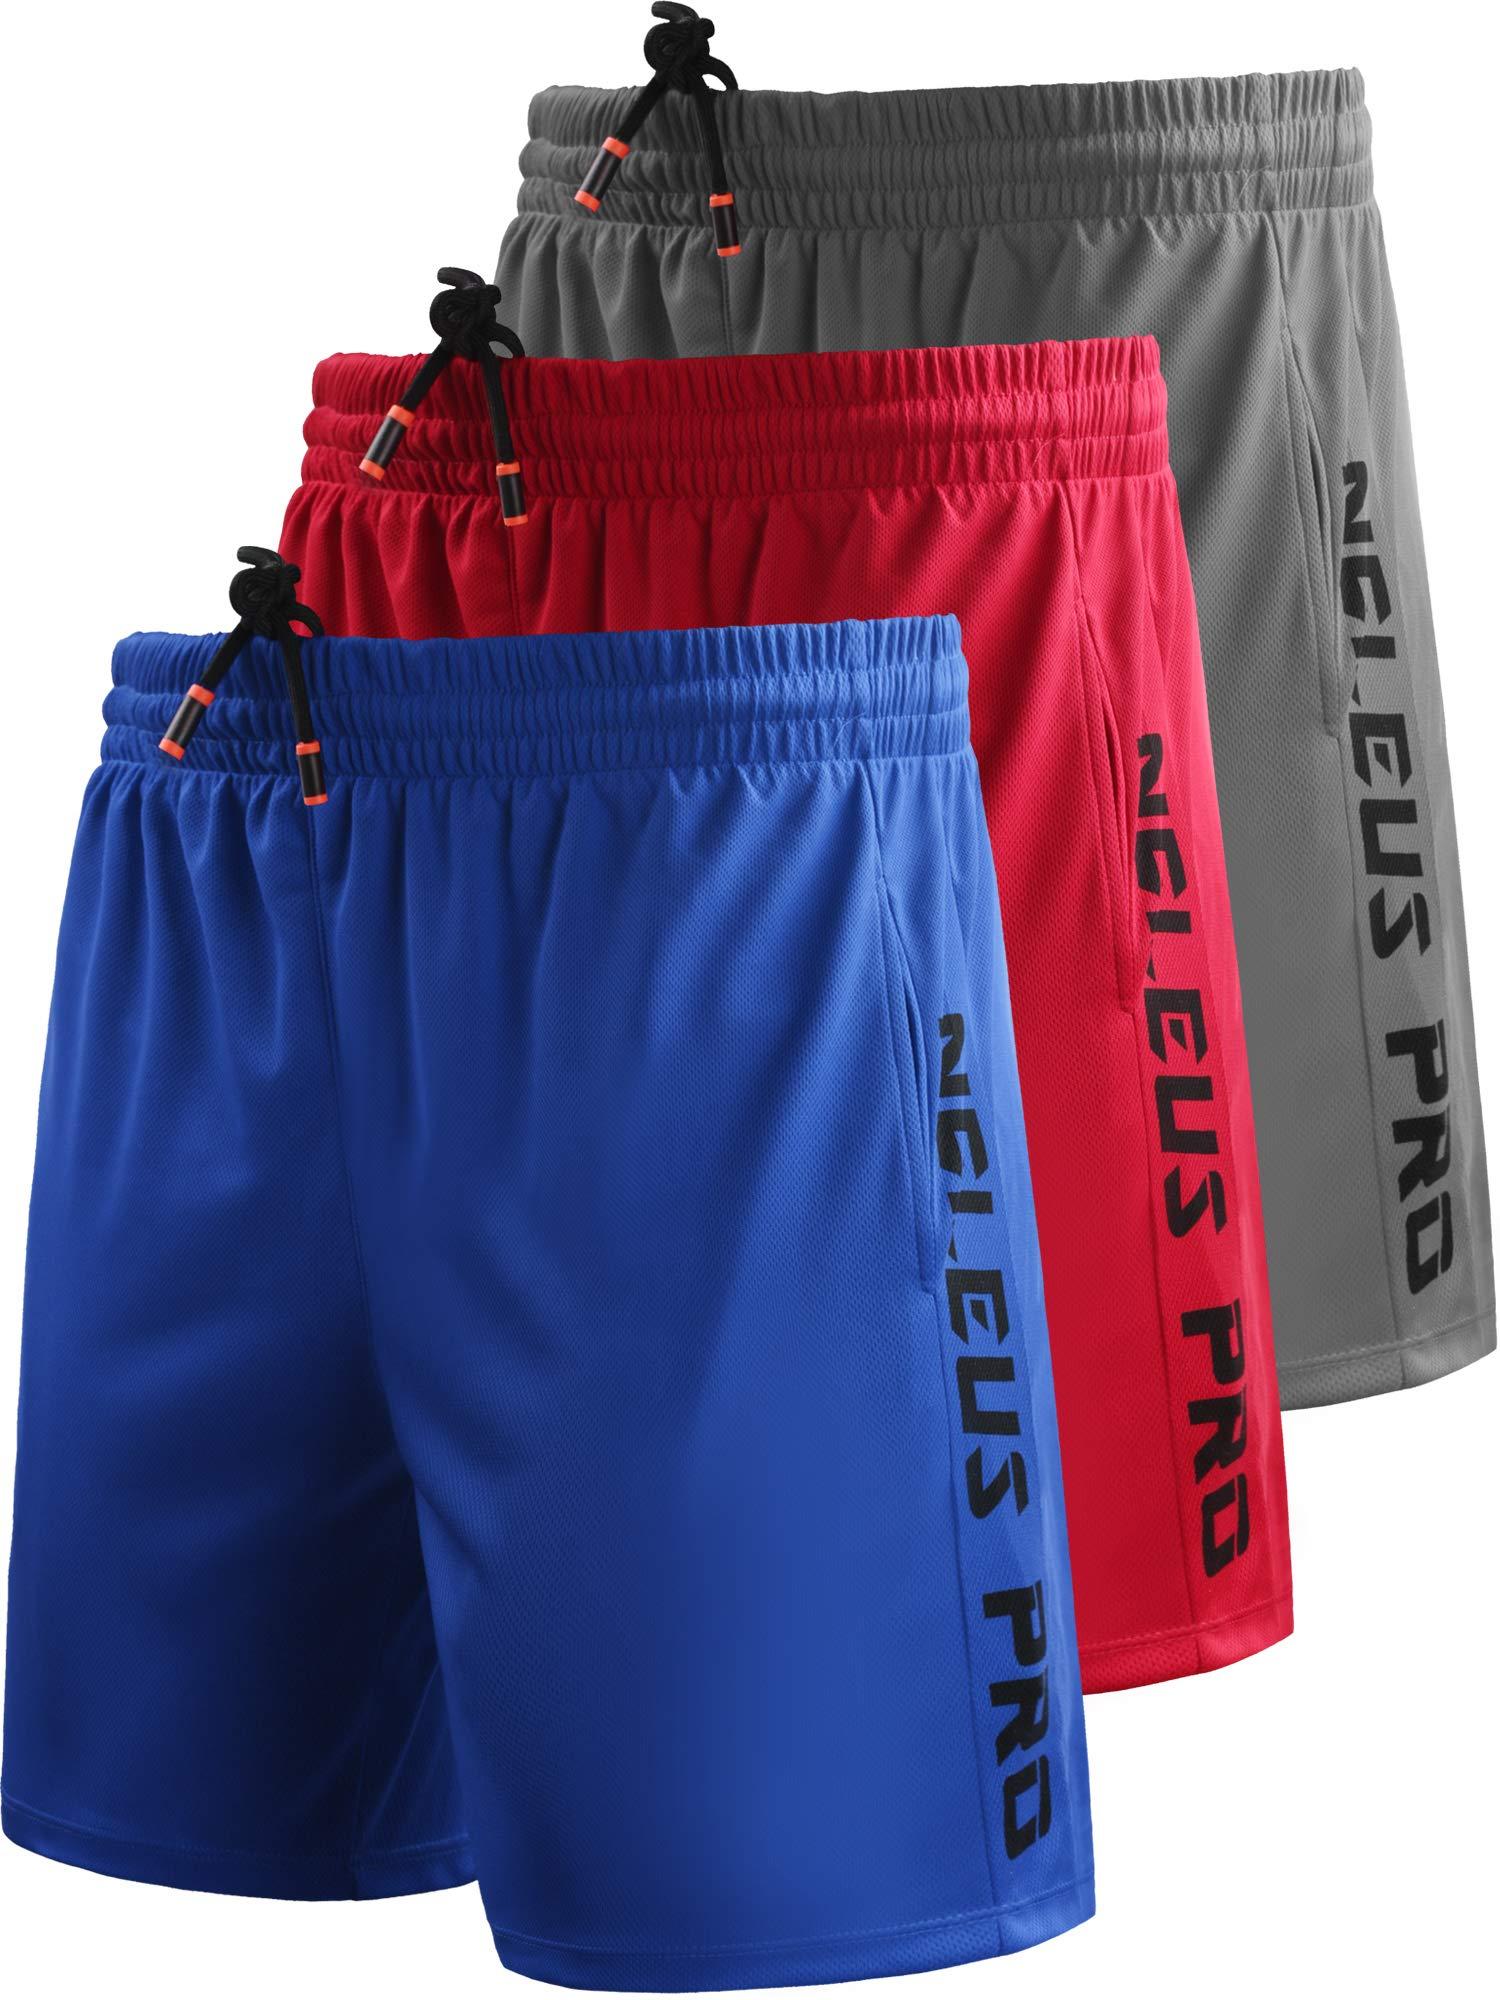 Neleus Men's 7'' Workout Running Shorts with Pockets,6056,3 Pack,Grey,Blue,Red,L,EU XL by Neleus